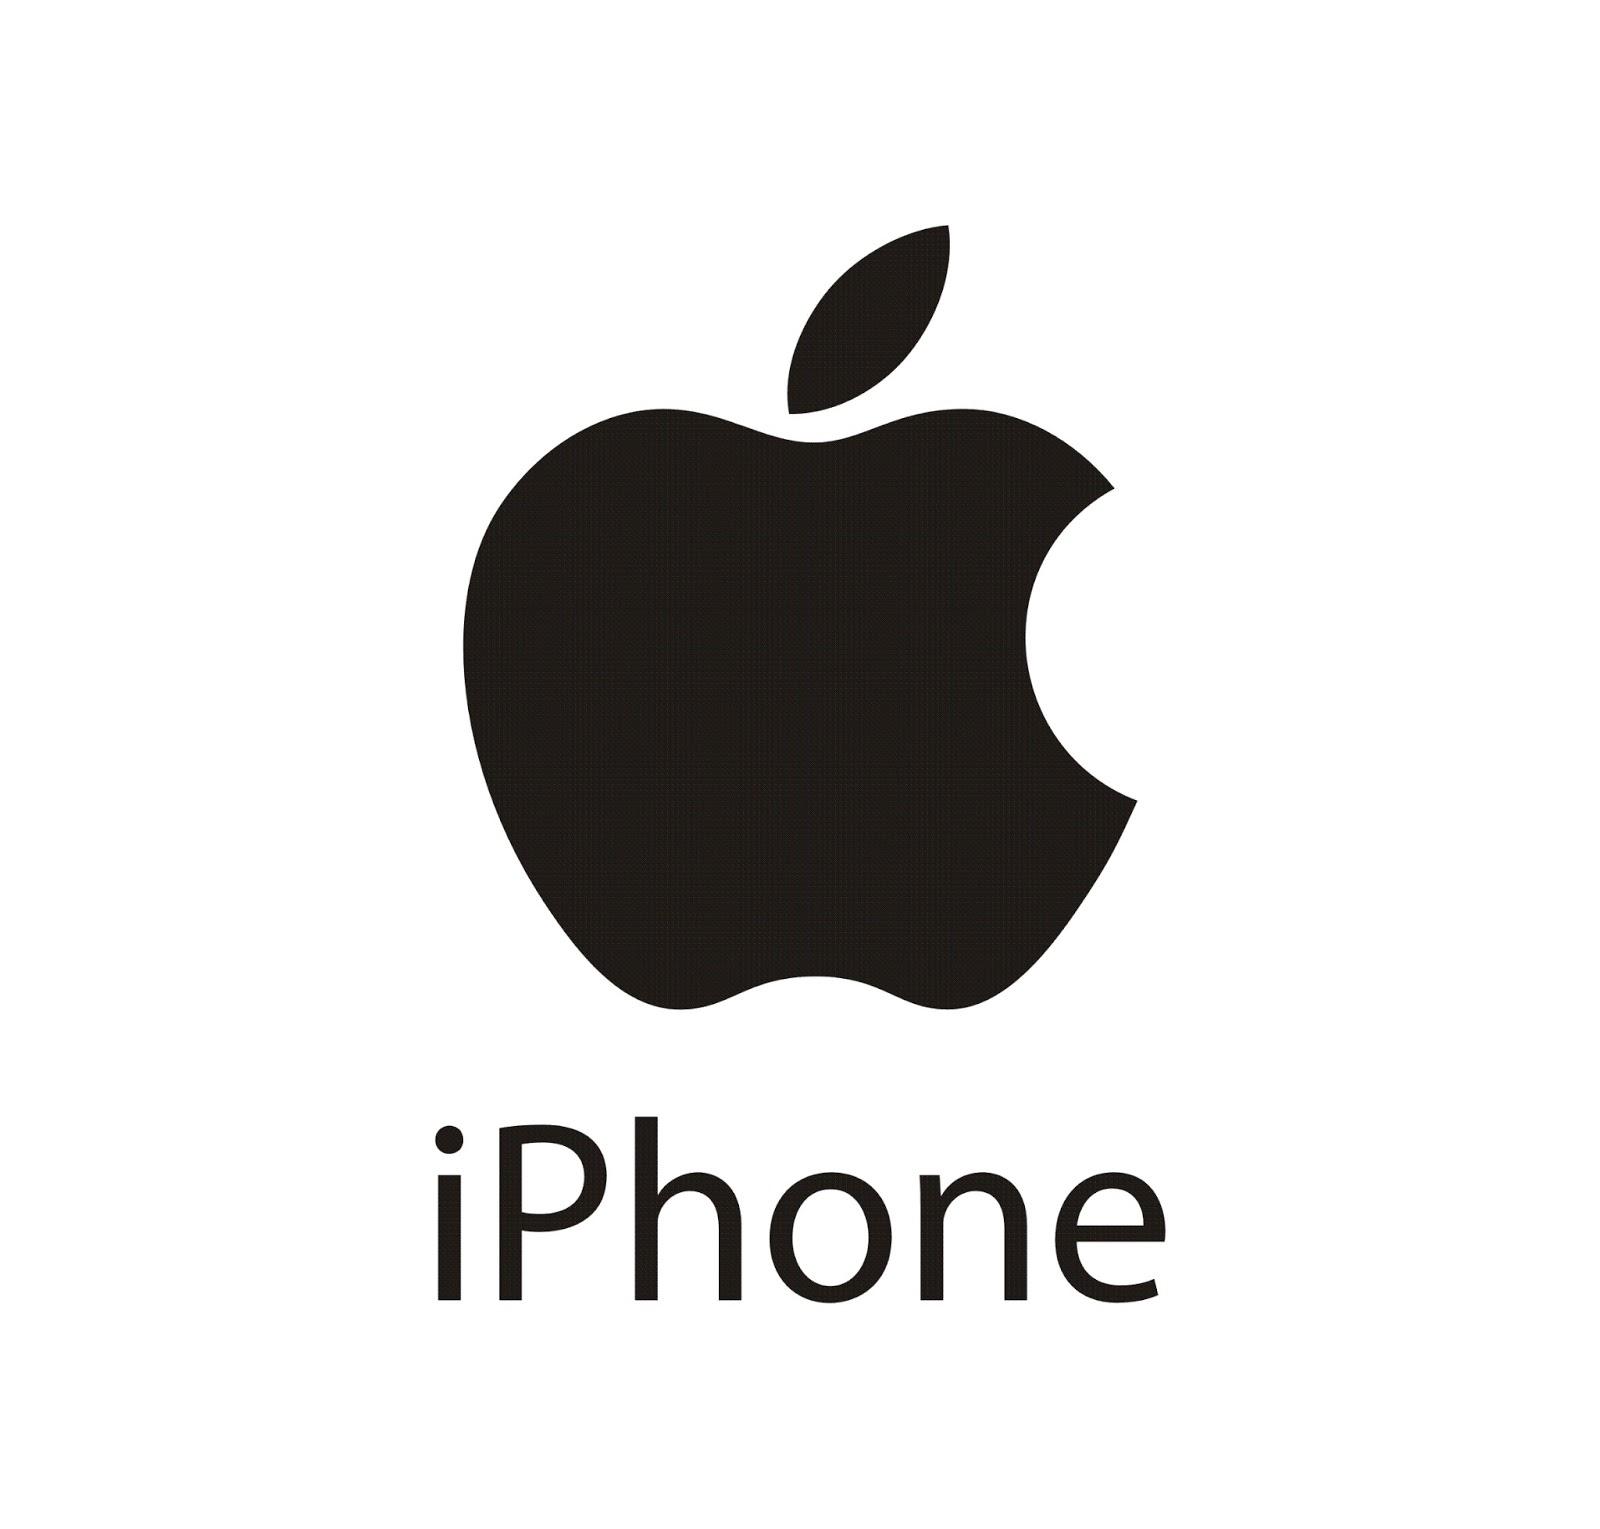 Pouzdra a kryty pro iPhone